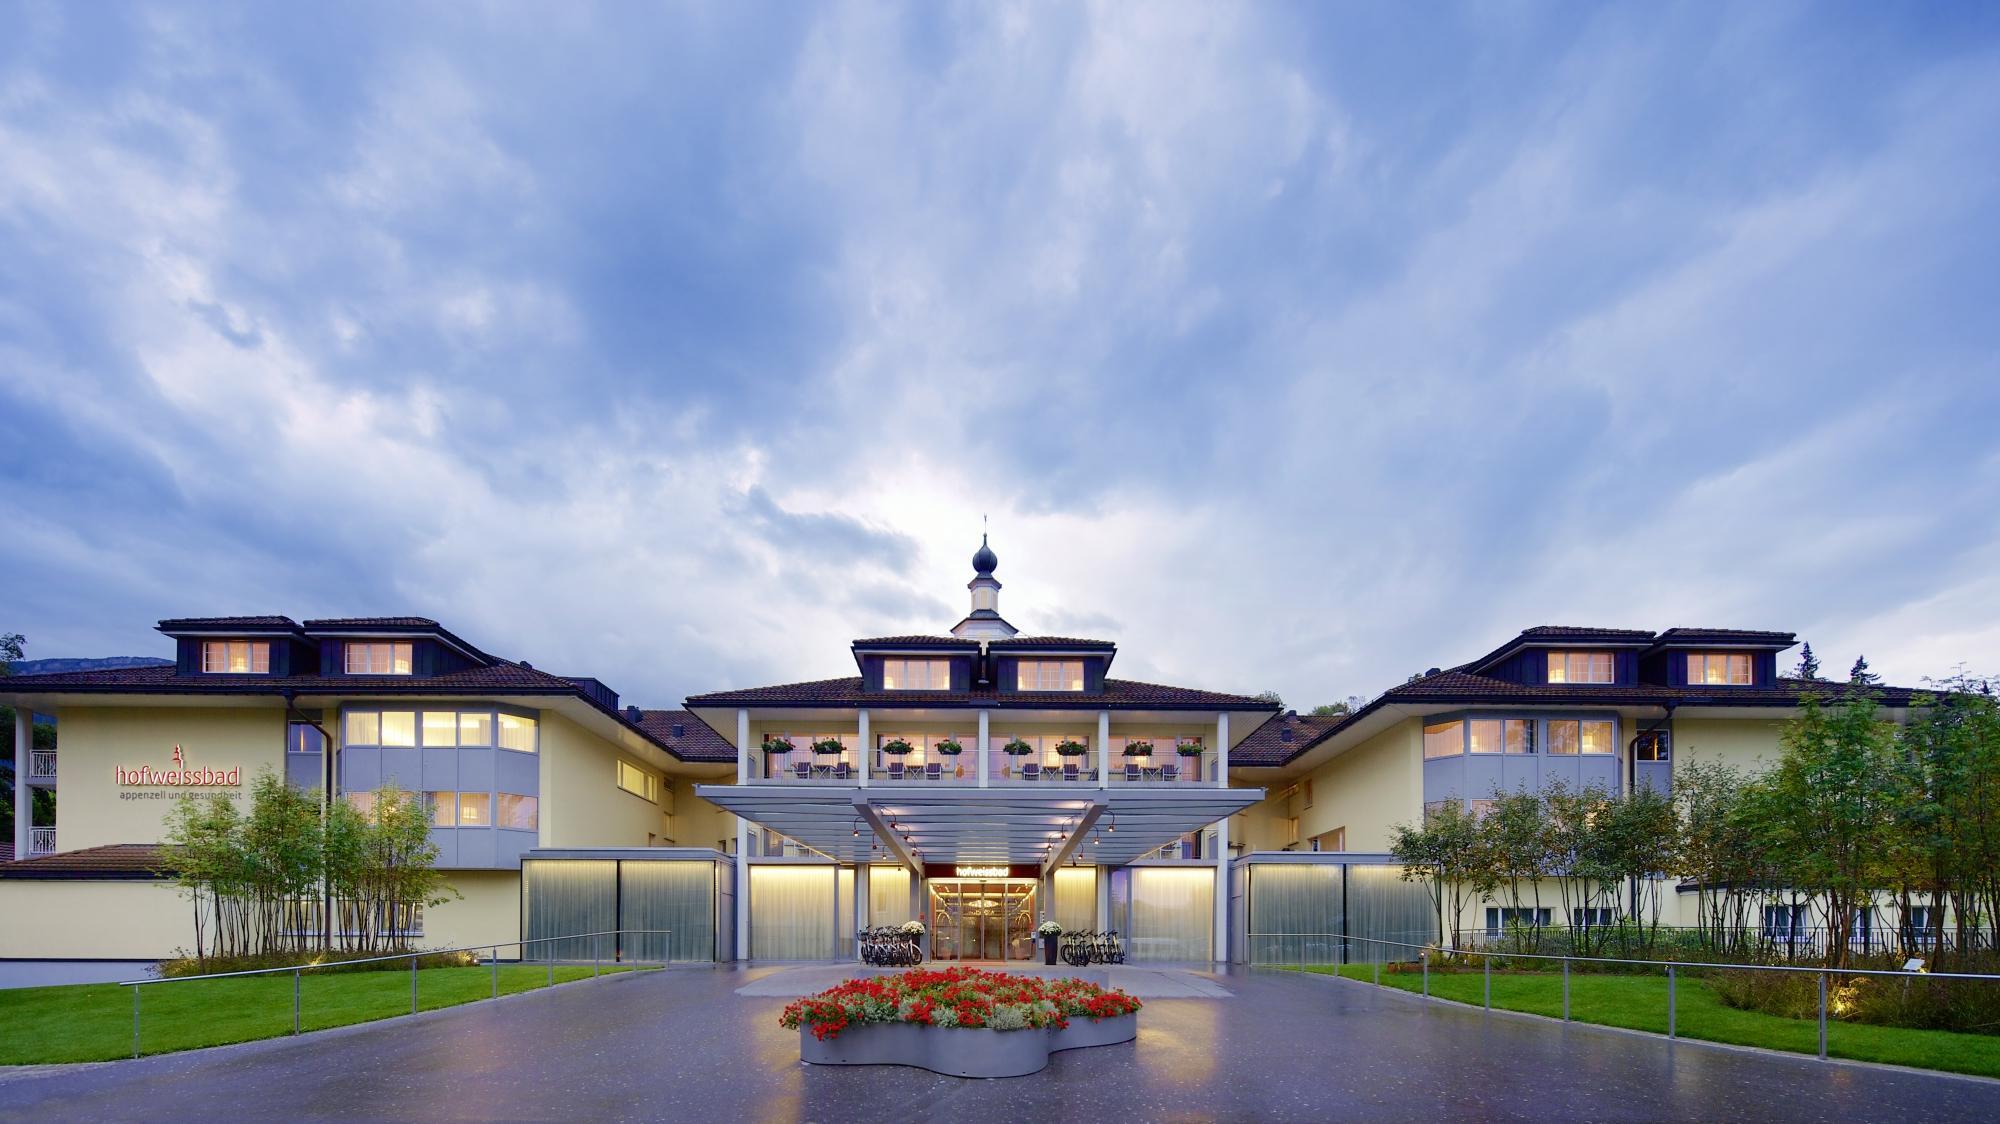 Hotel Hof Weissbad